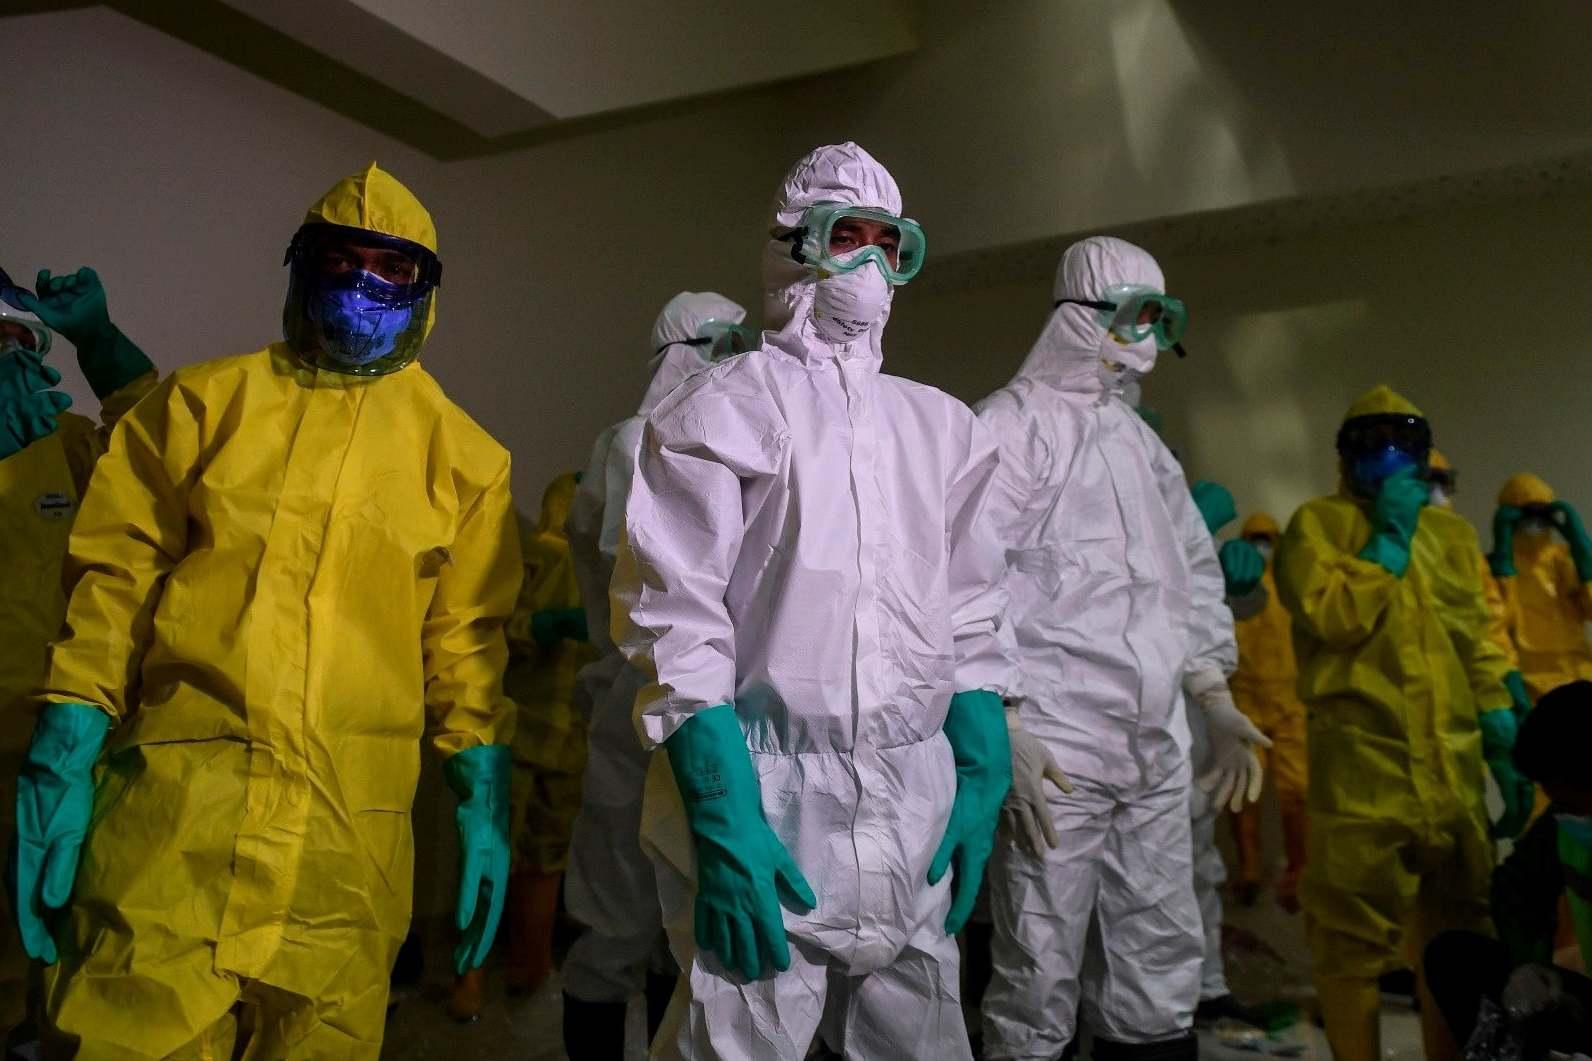 Ситуация по коронавирусу в мире и в России на 5 марта